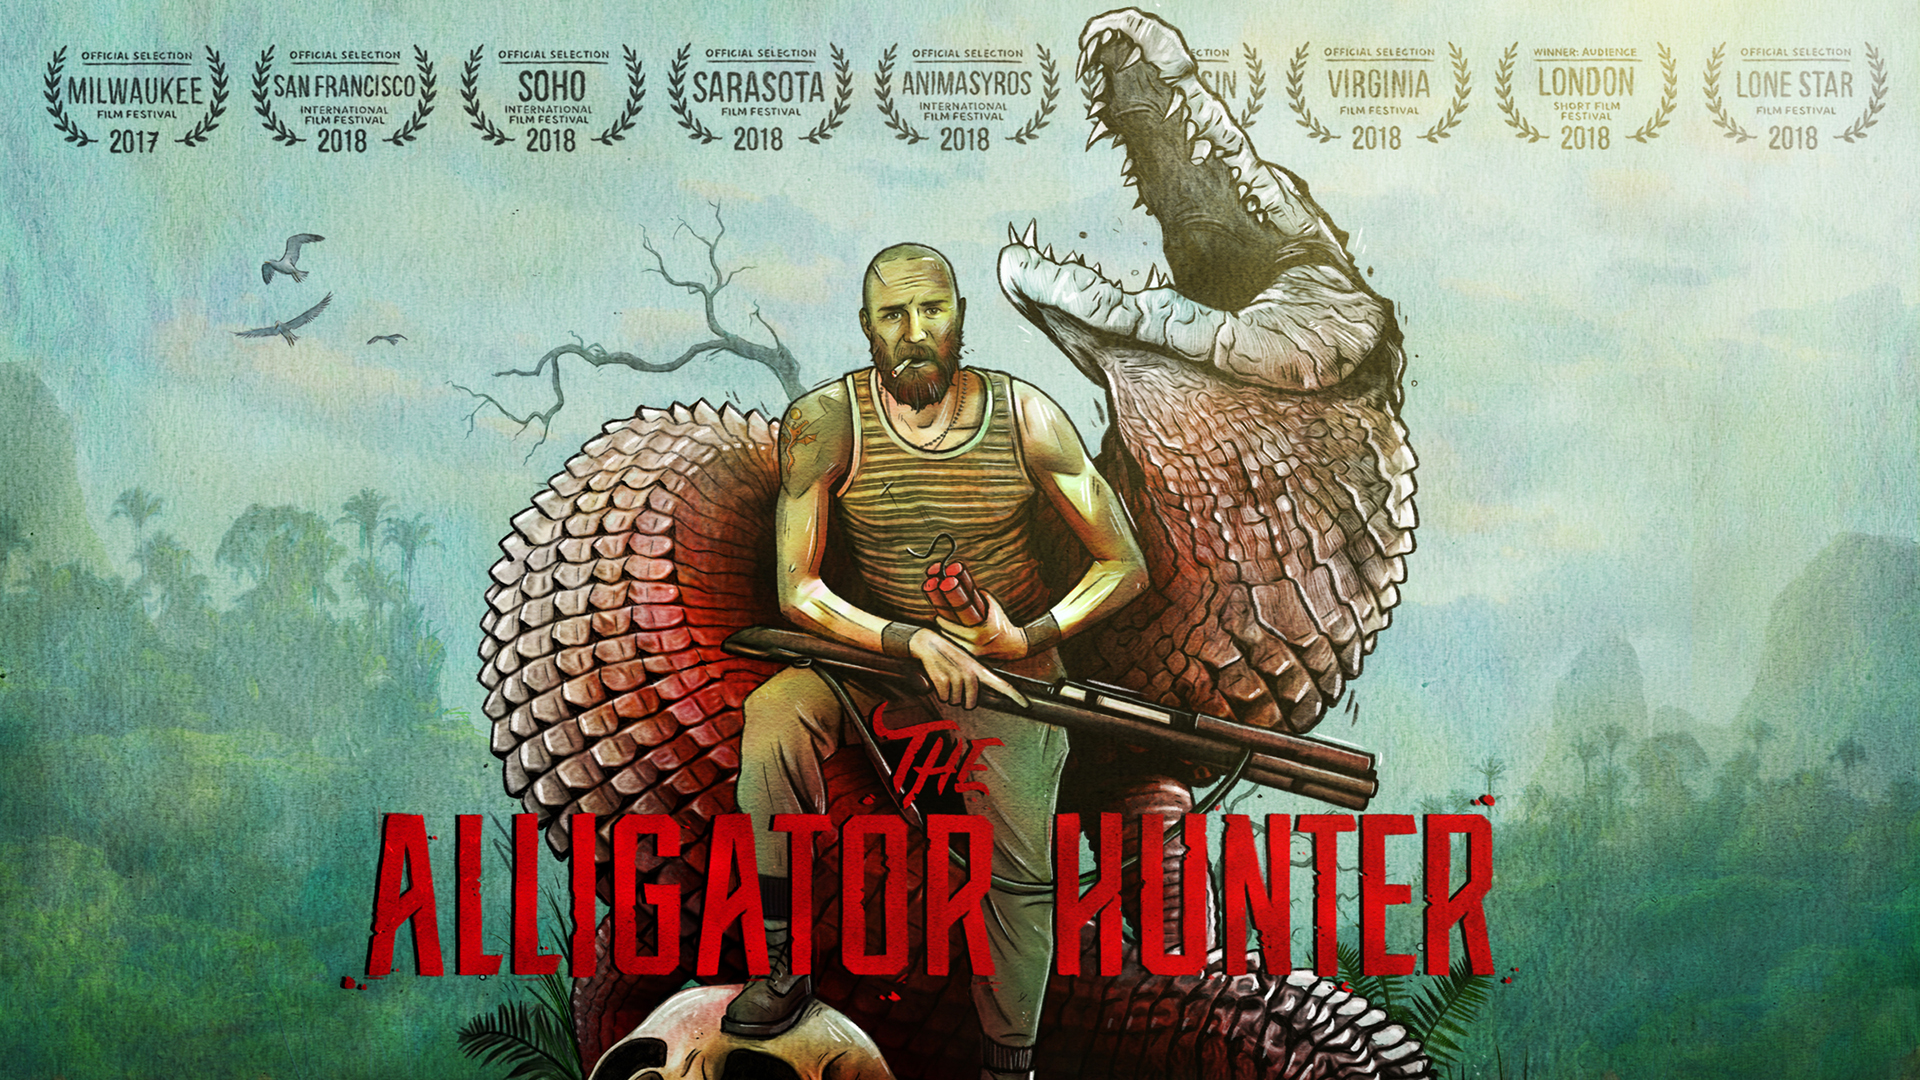 19-4-9 gator hunter poster thumbnail 2 small.jpg